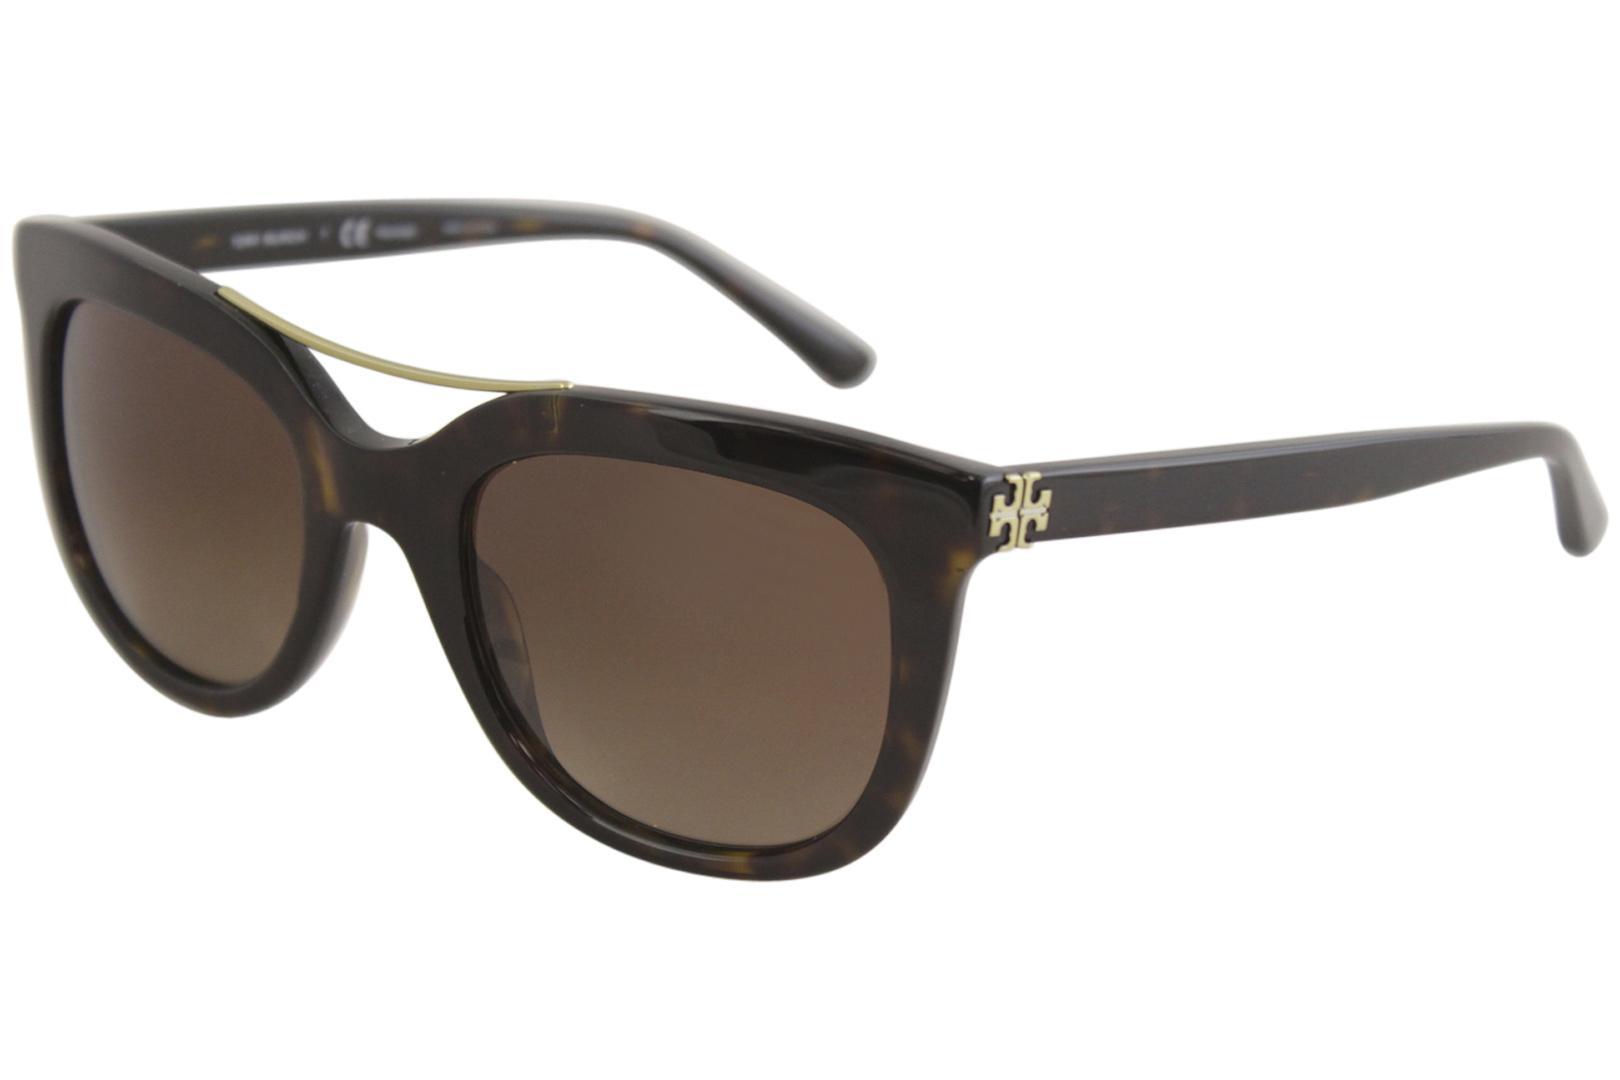 43d33ffbd1a0 Tory Burch Women's TY7105 TY/7105 Fashion Sunglasses